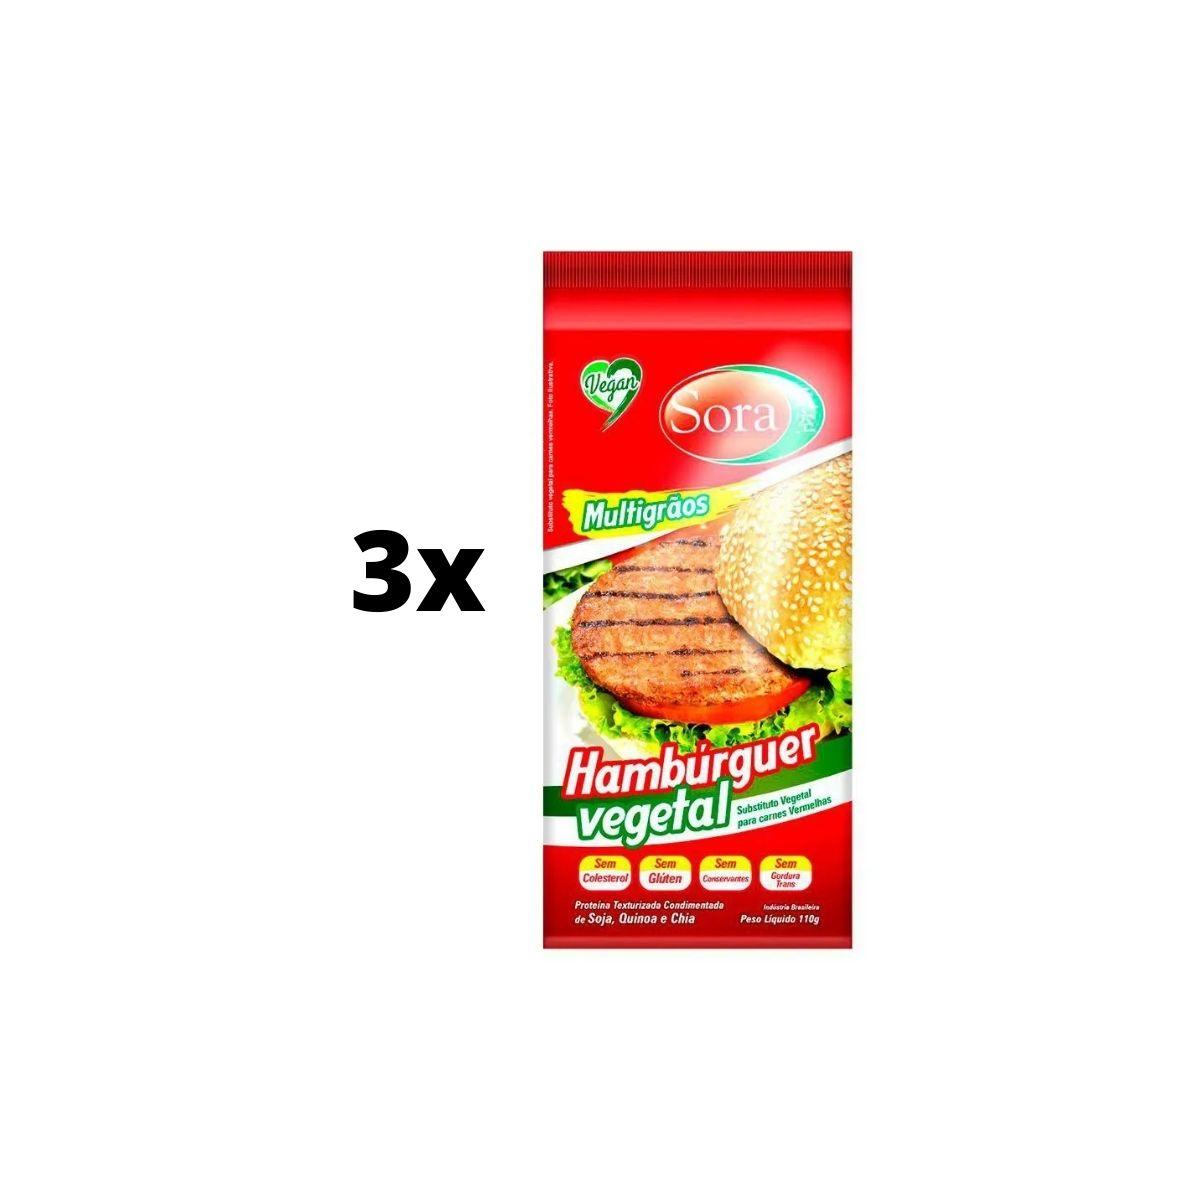 Kit 3 Hamburguer de soja carne vermelha - Sora